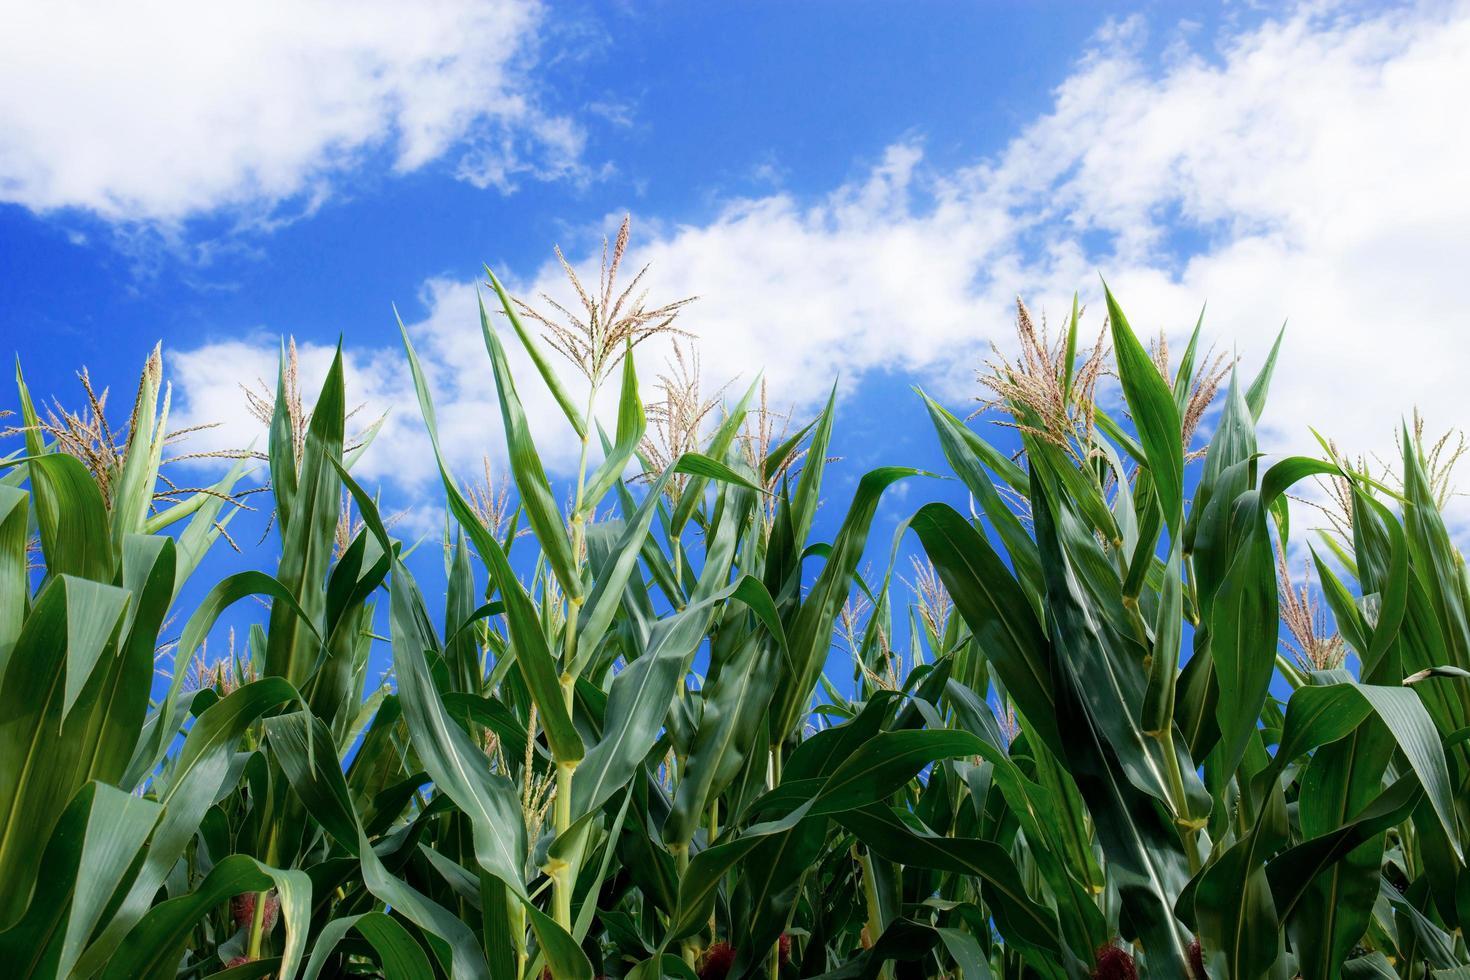 Corn plants at blue sky. photo